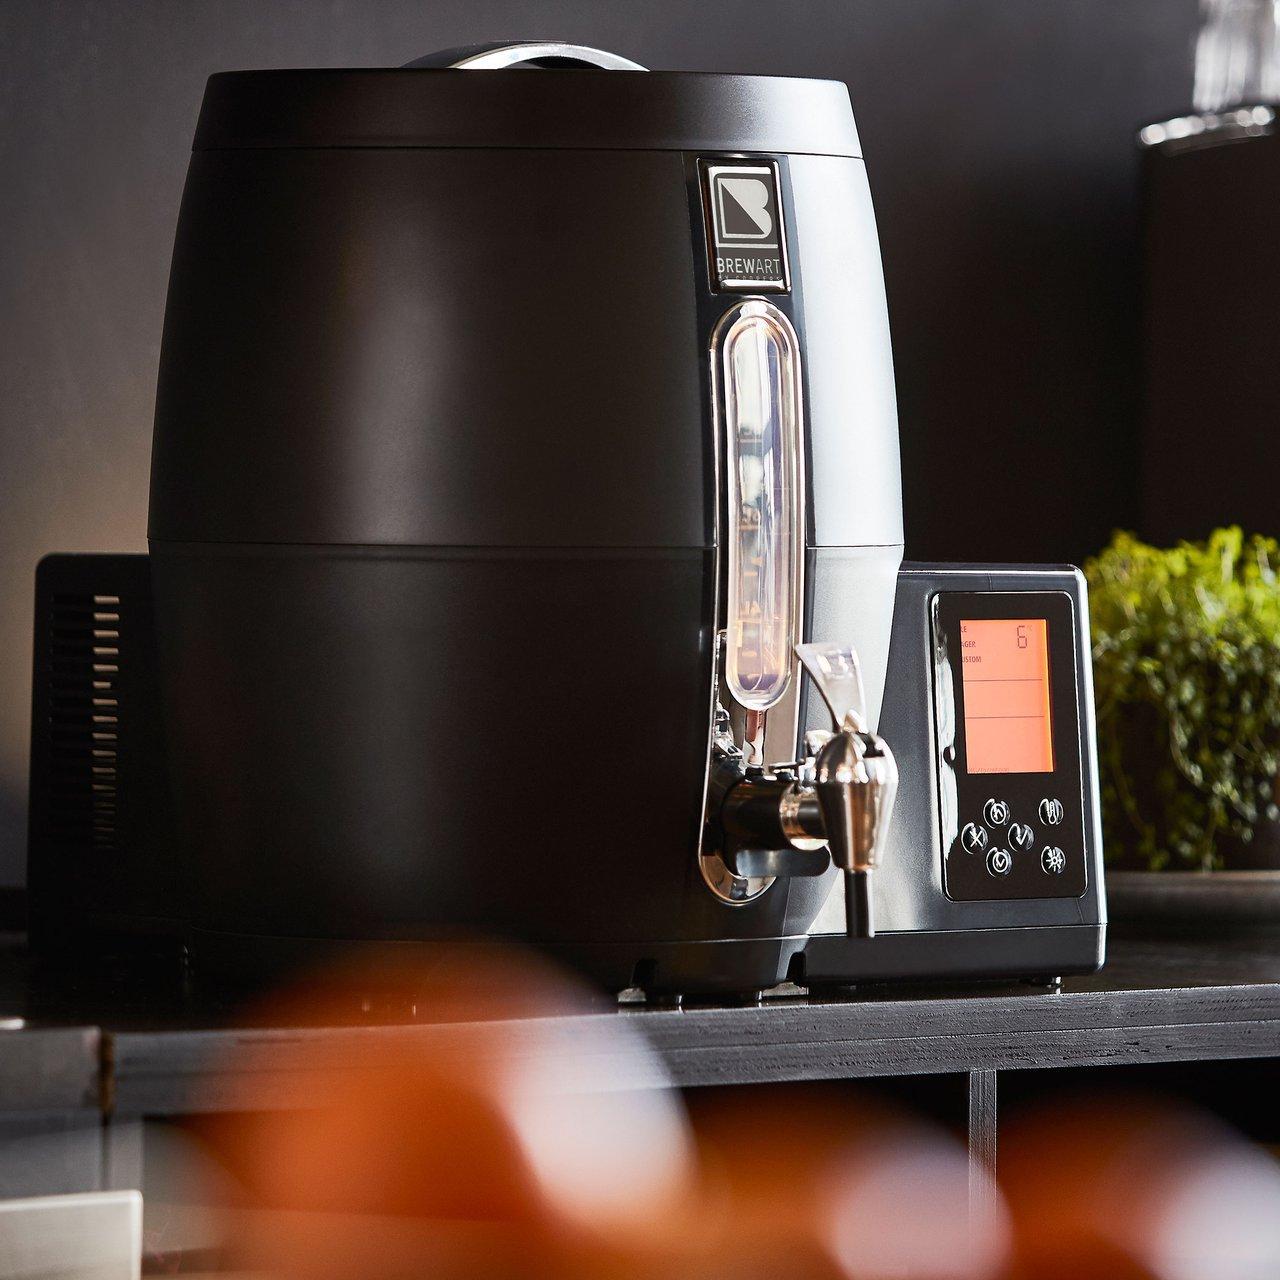 BrewArt Complete Beer Brewing & Dispensing System